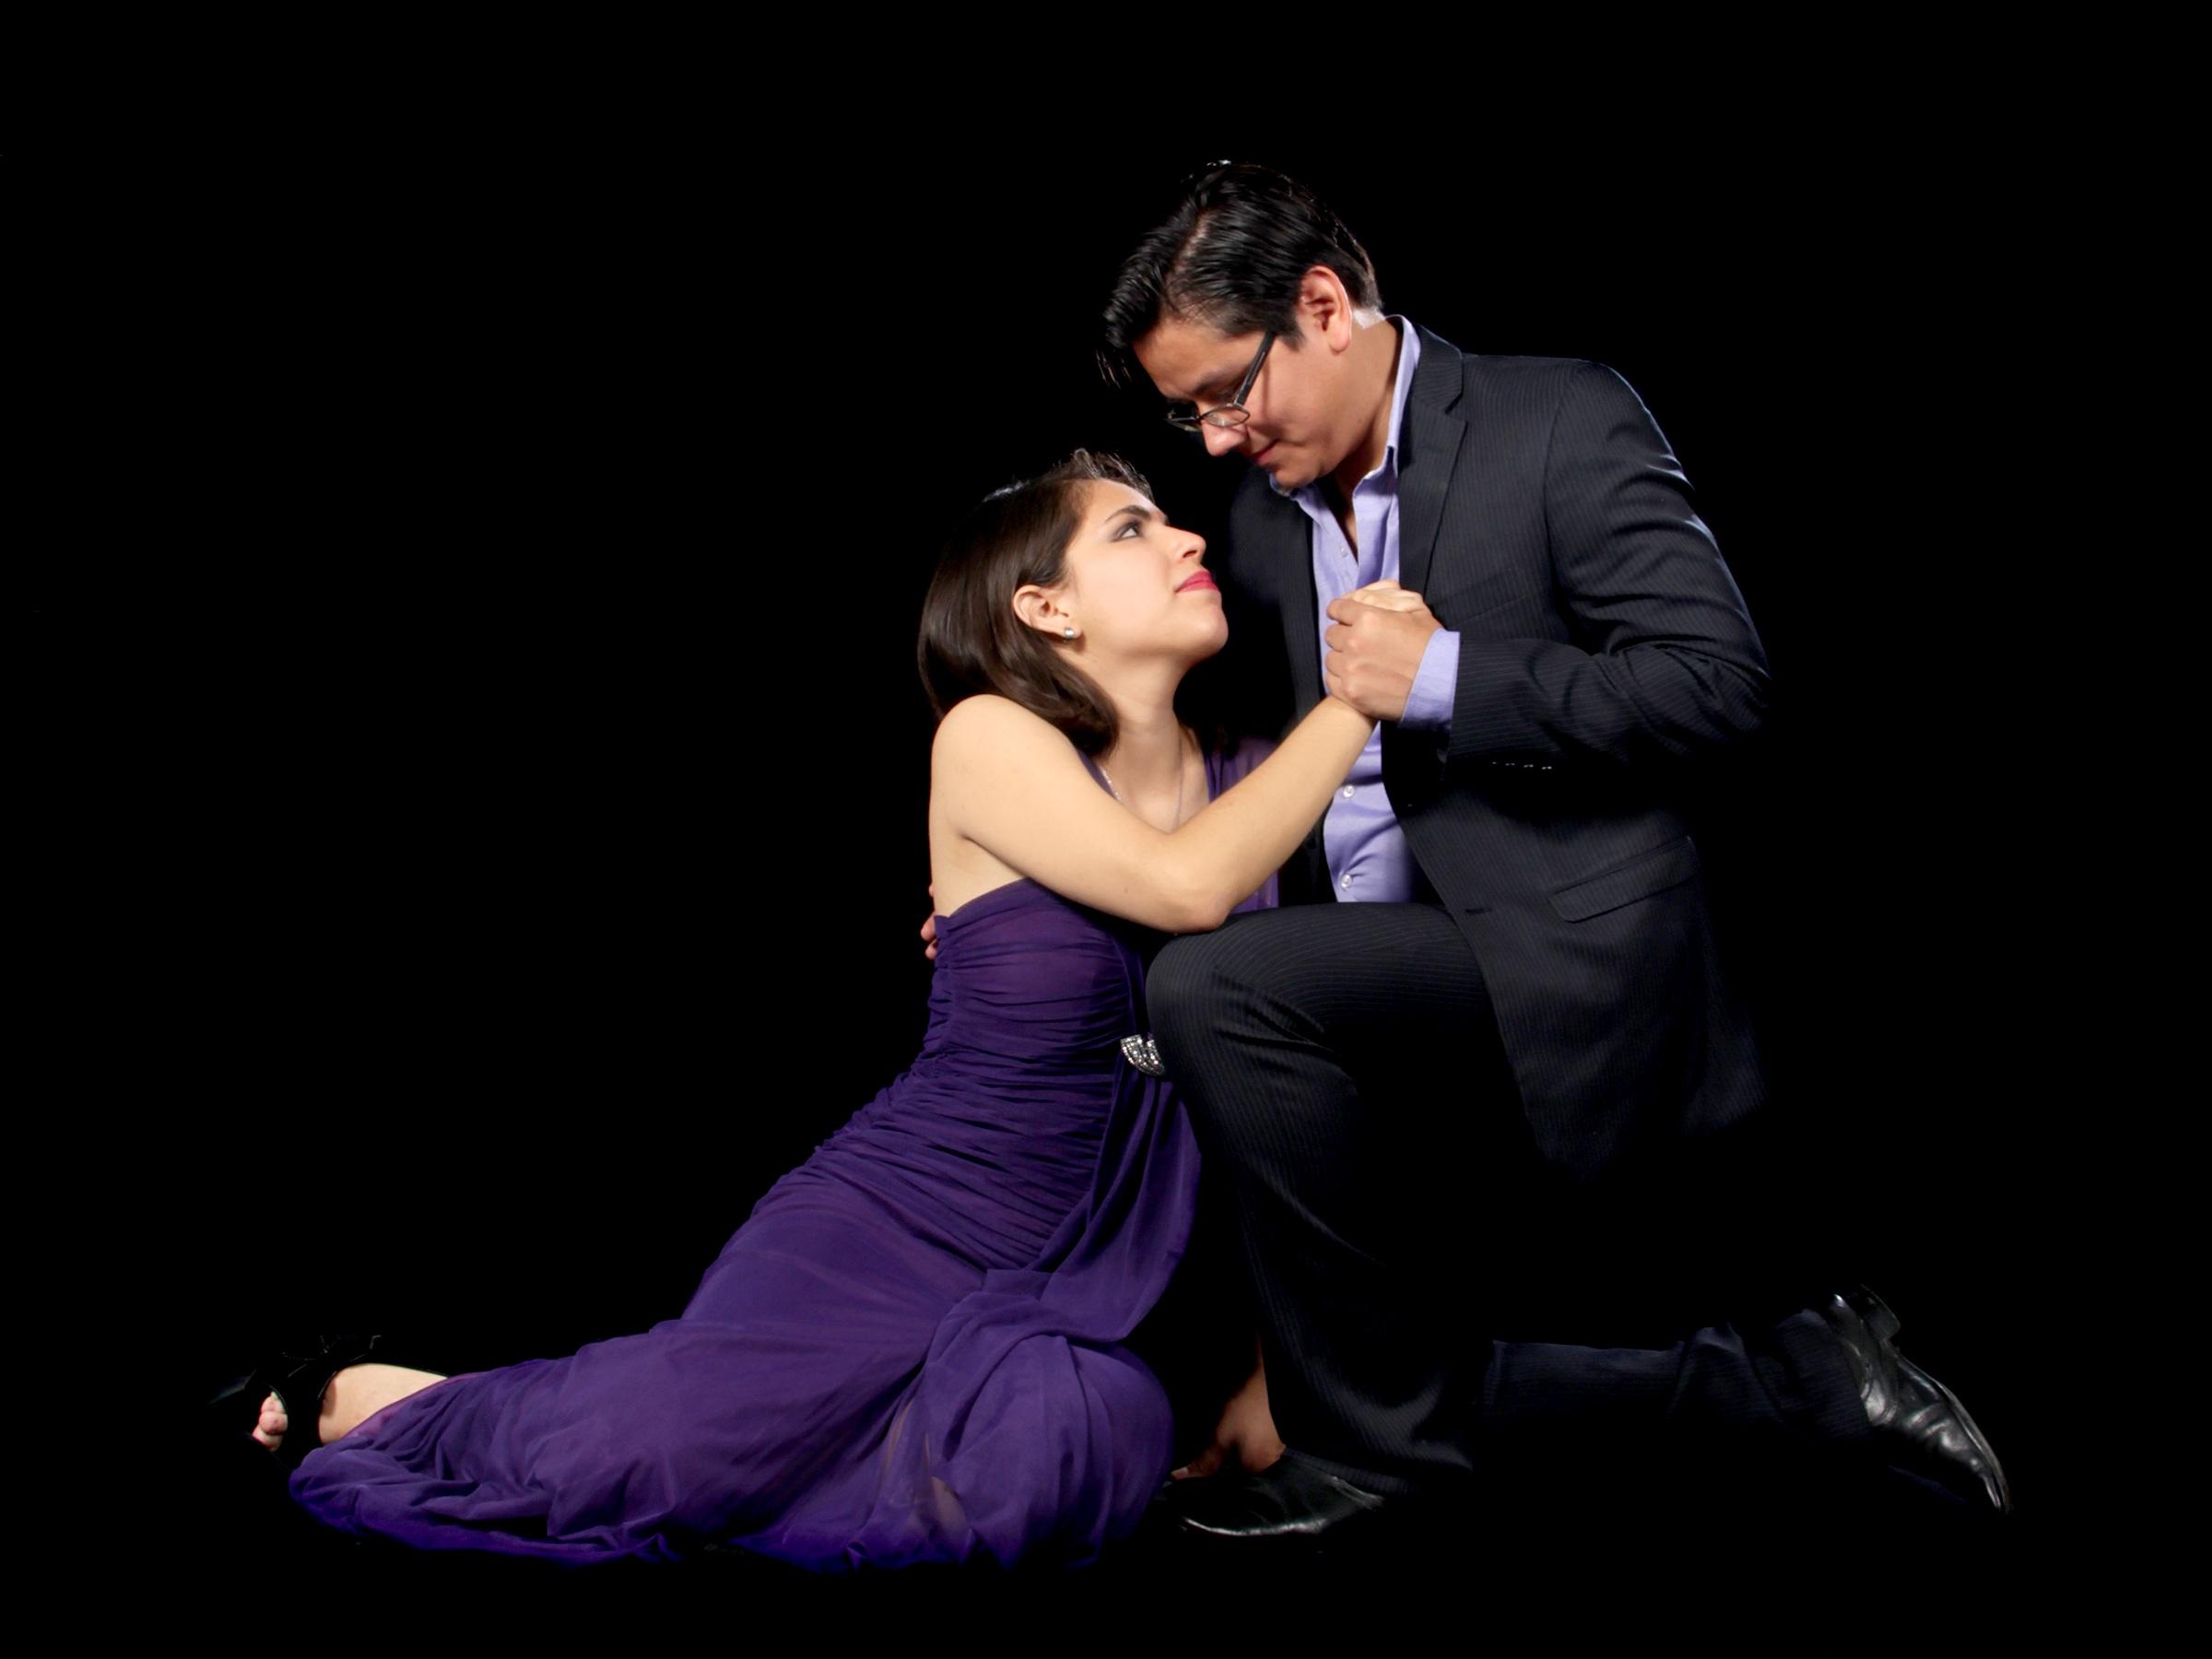 Фильм танго для романтики бесплатно фото 801-181